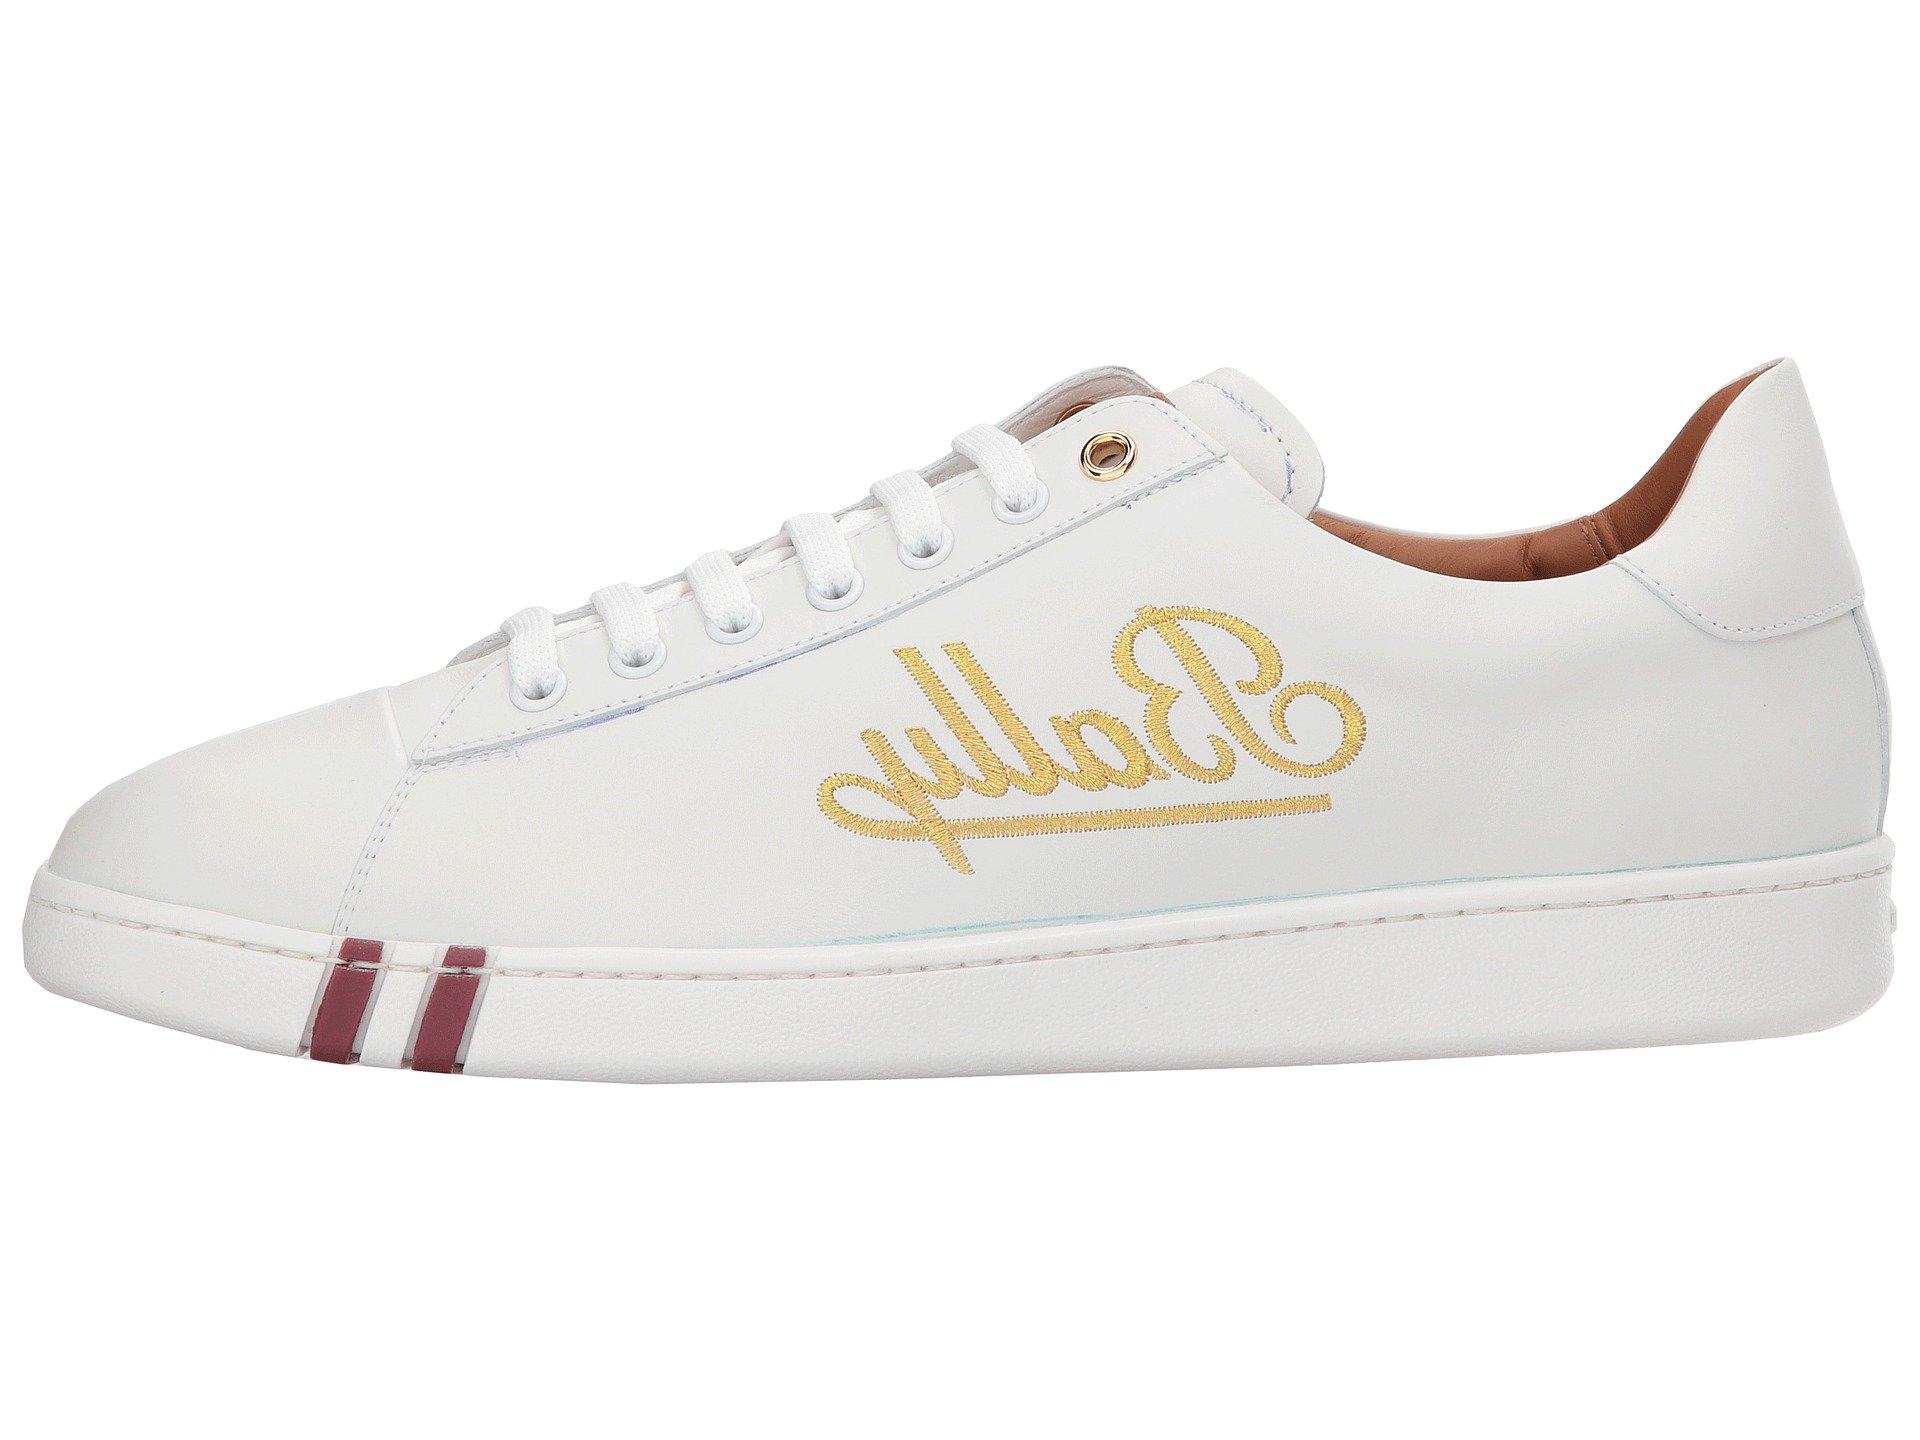 Winston Winston White Bally Bally Sneaker Bally White Sneaker Winston wqCffH